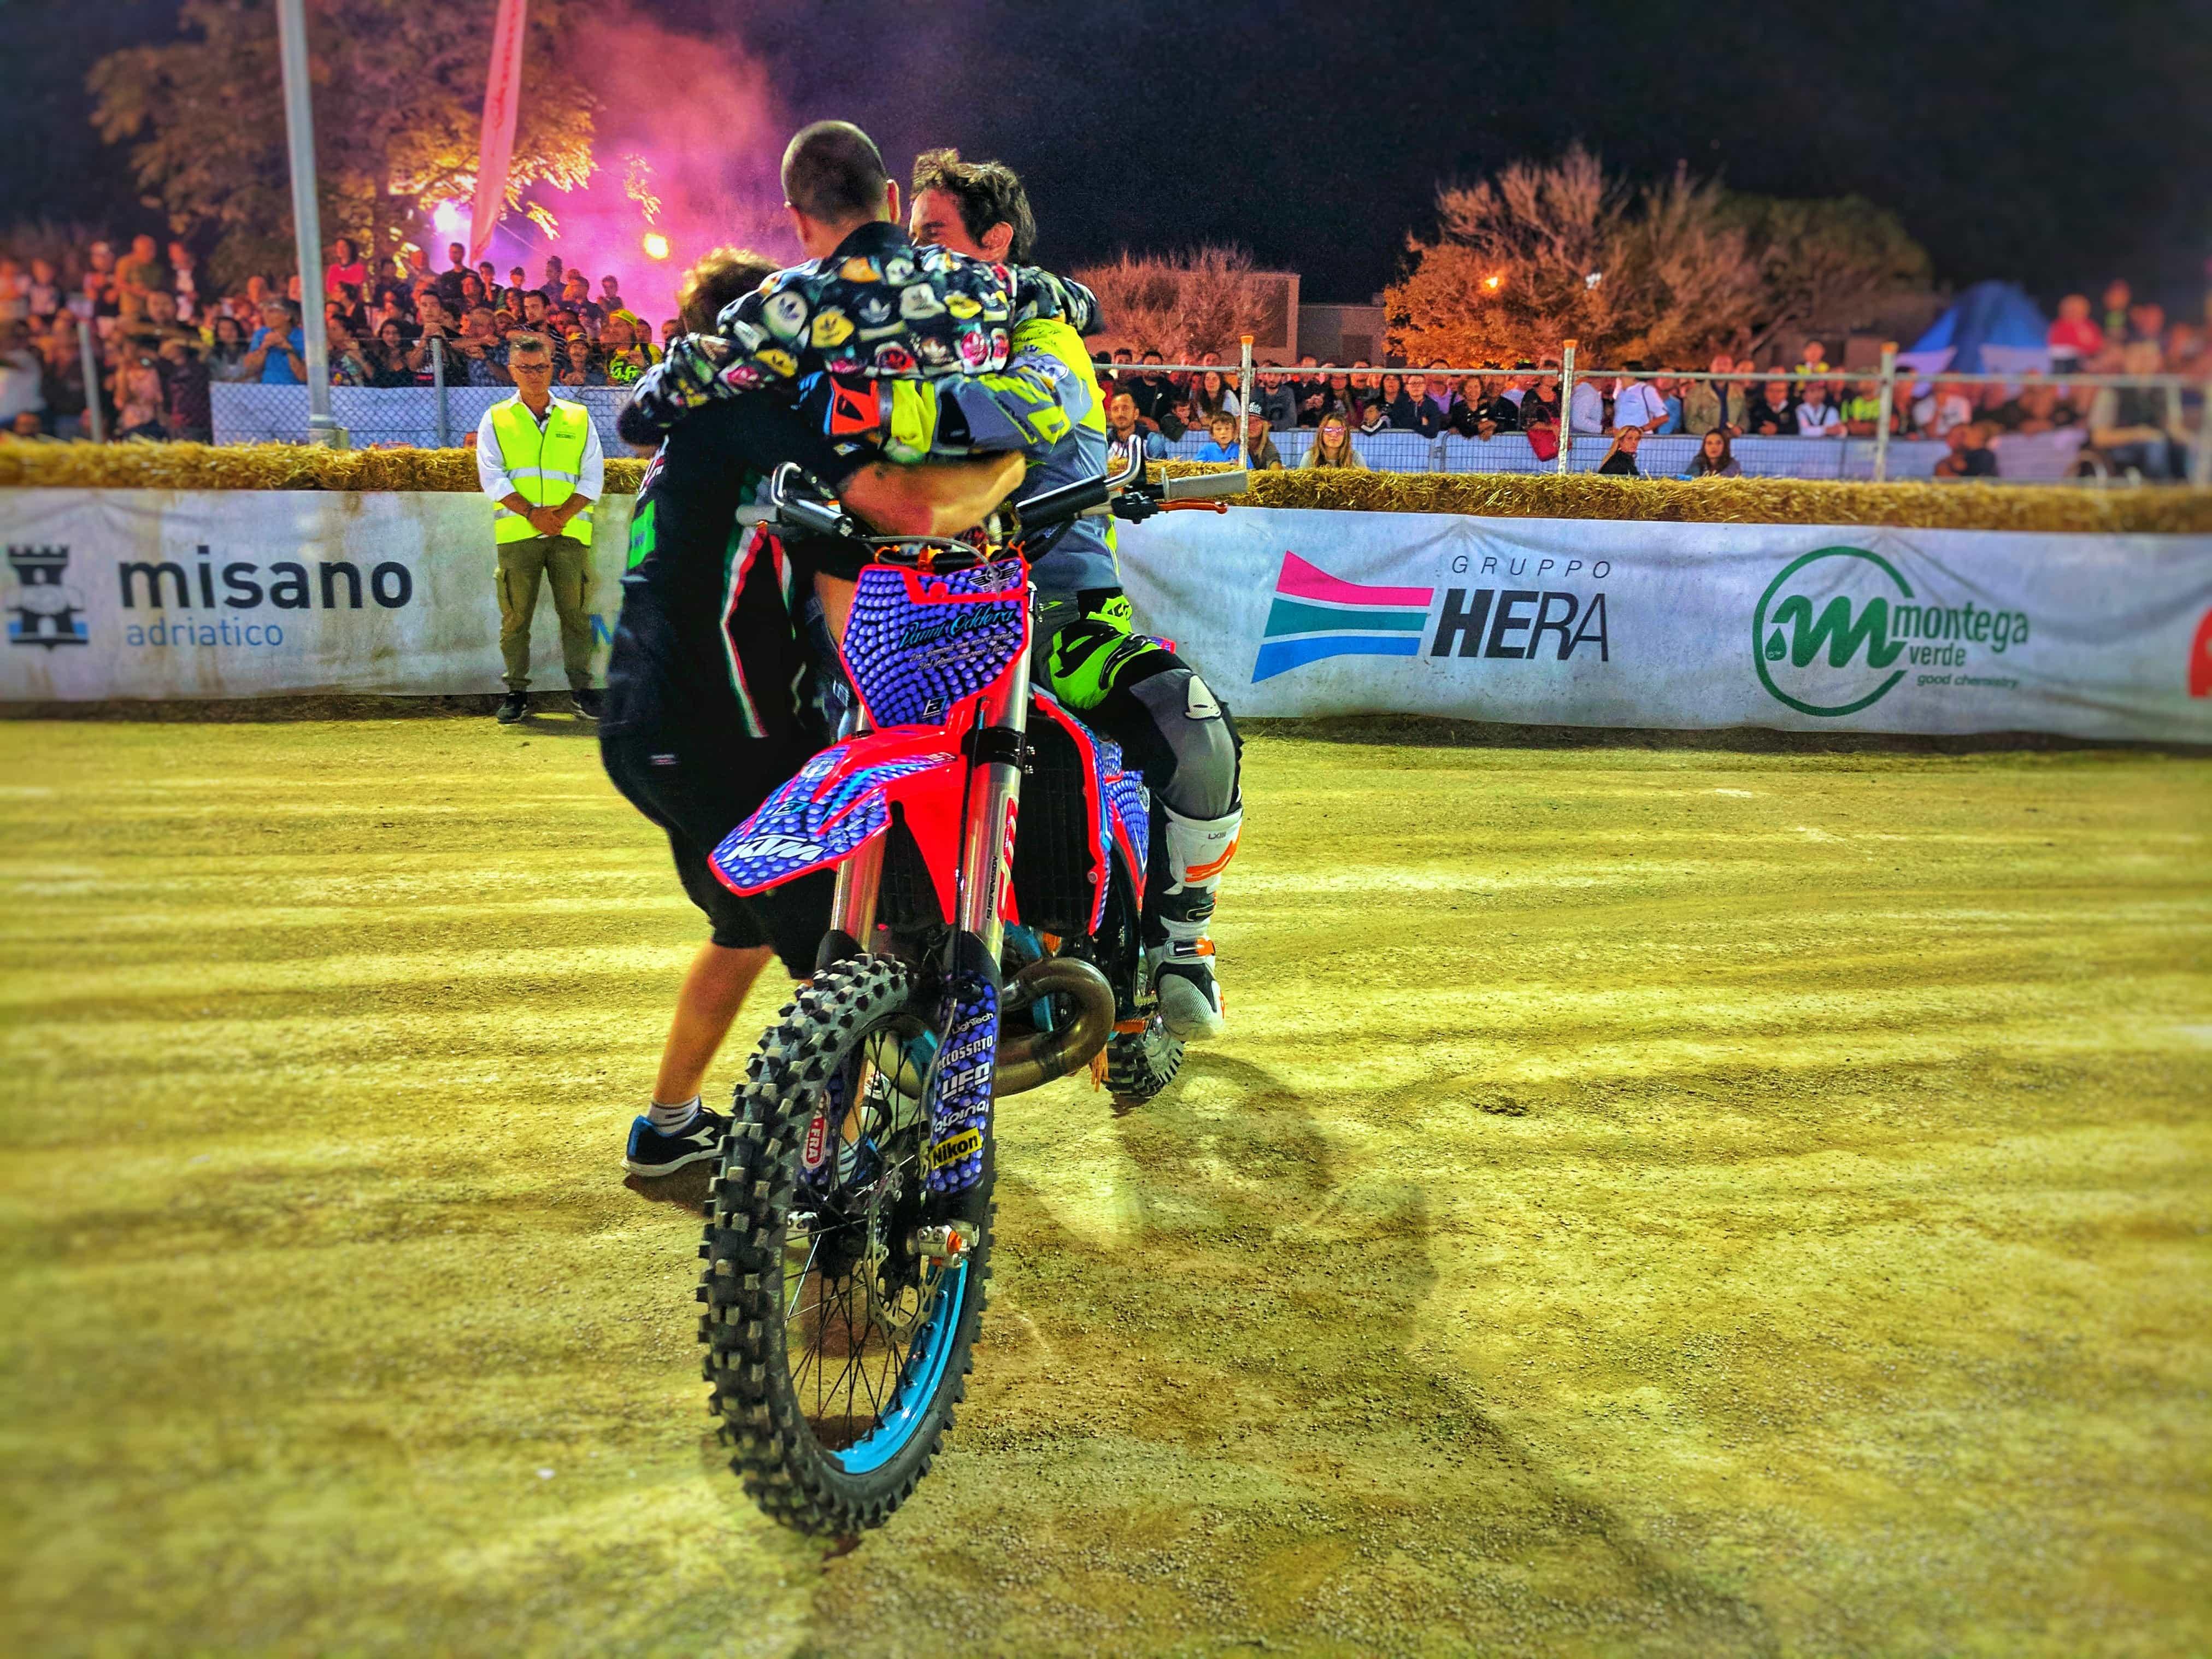 Top Three Must Have Motocross Gear The Aspiring Gentleman